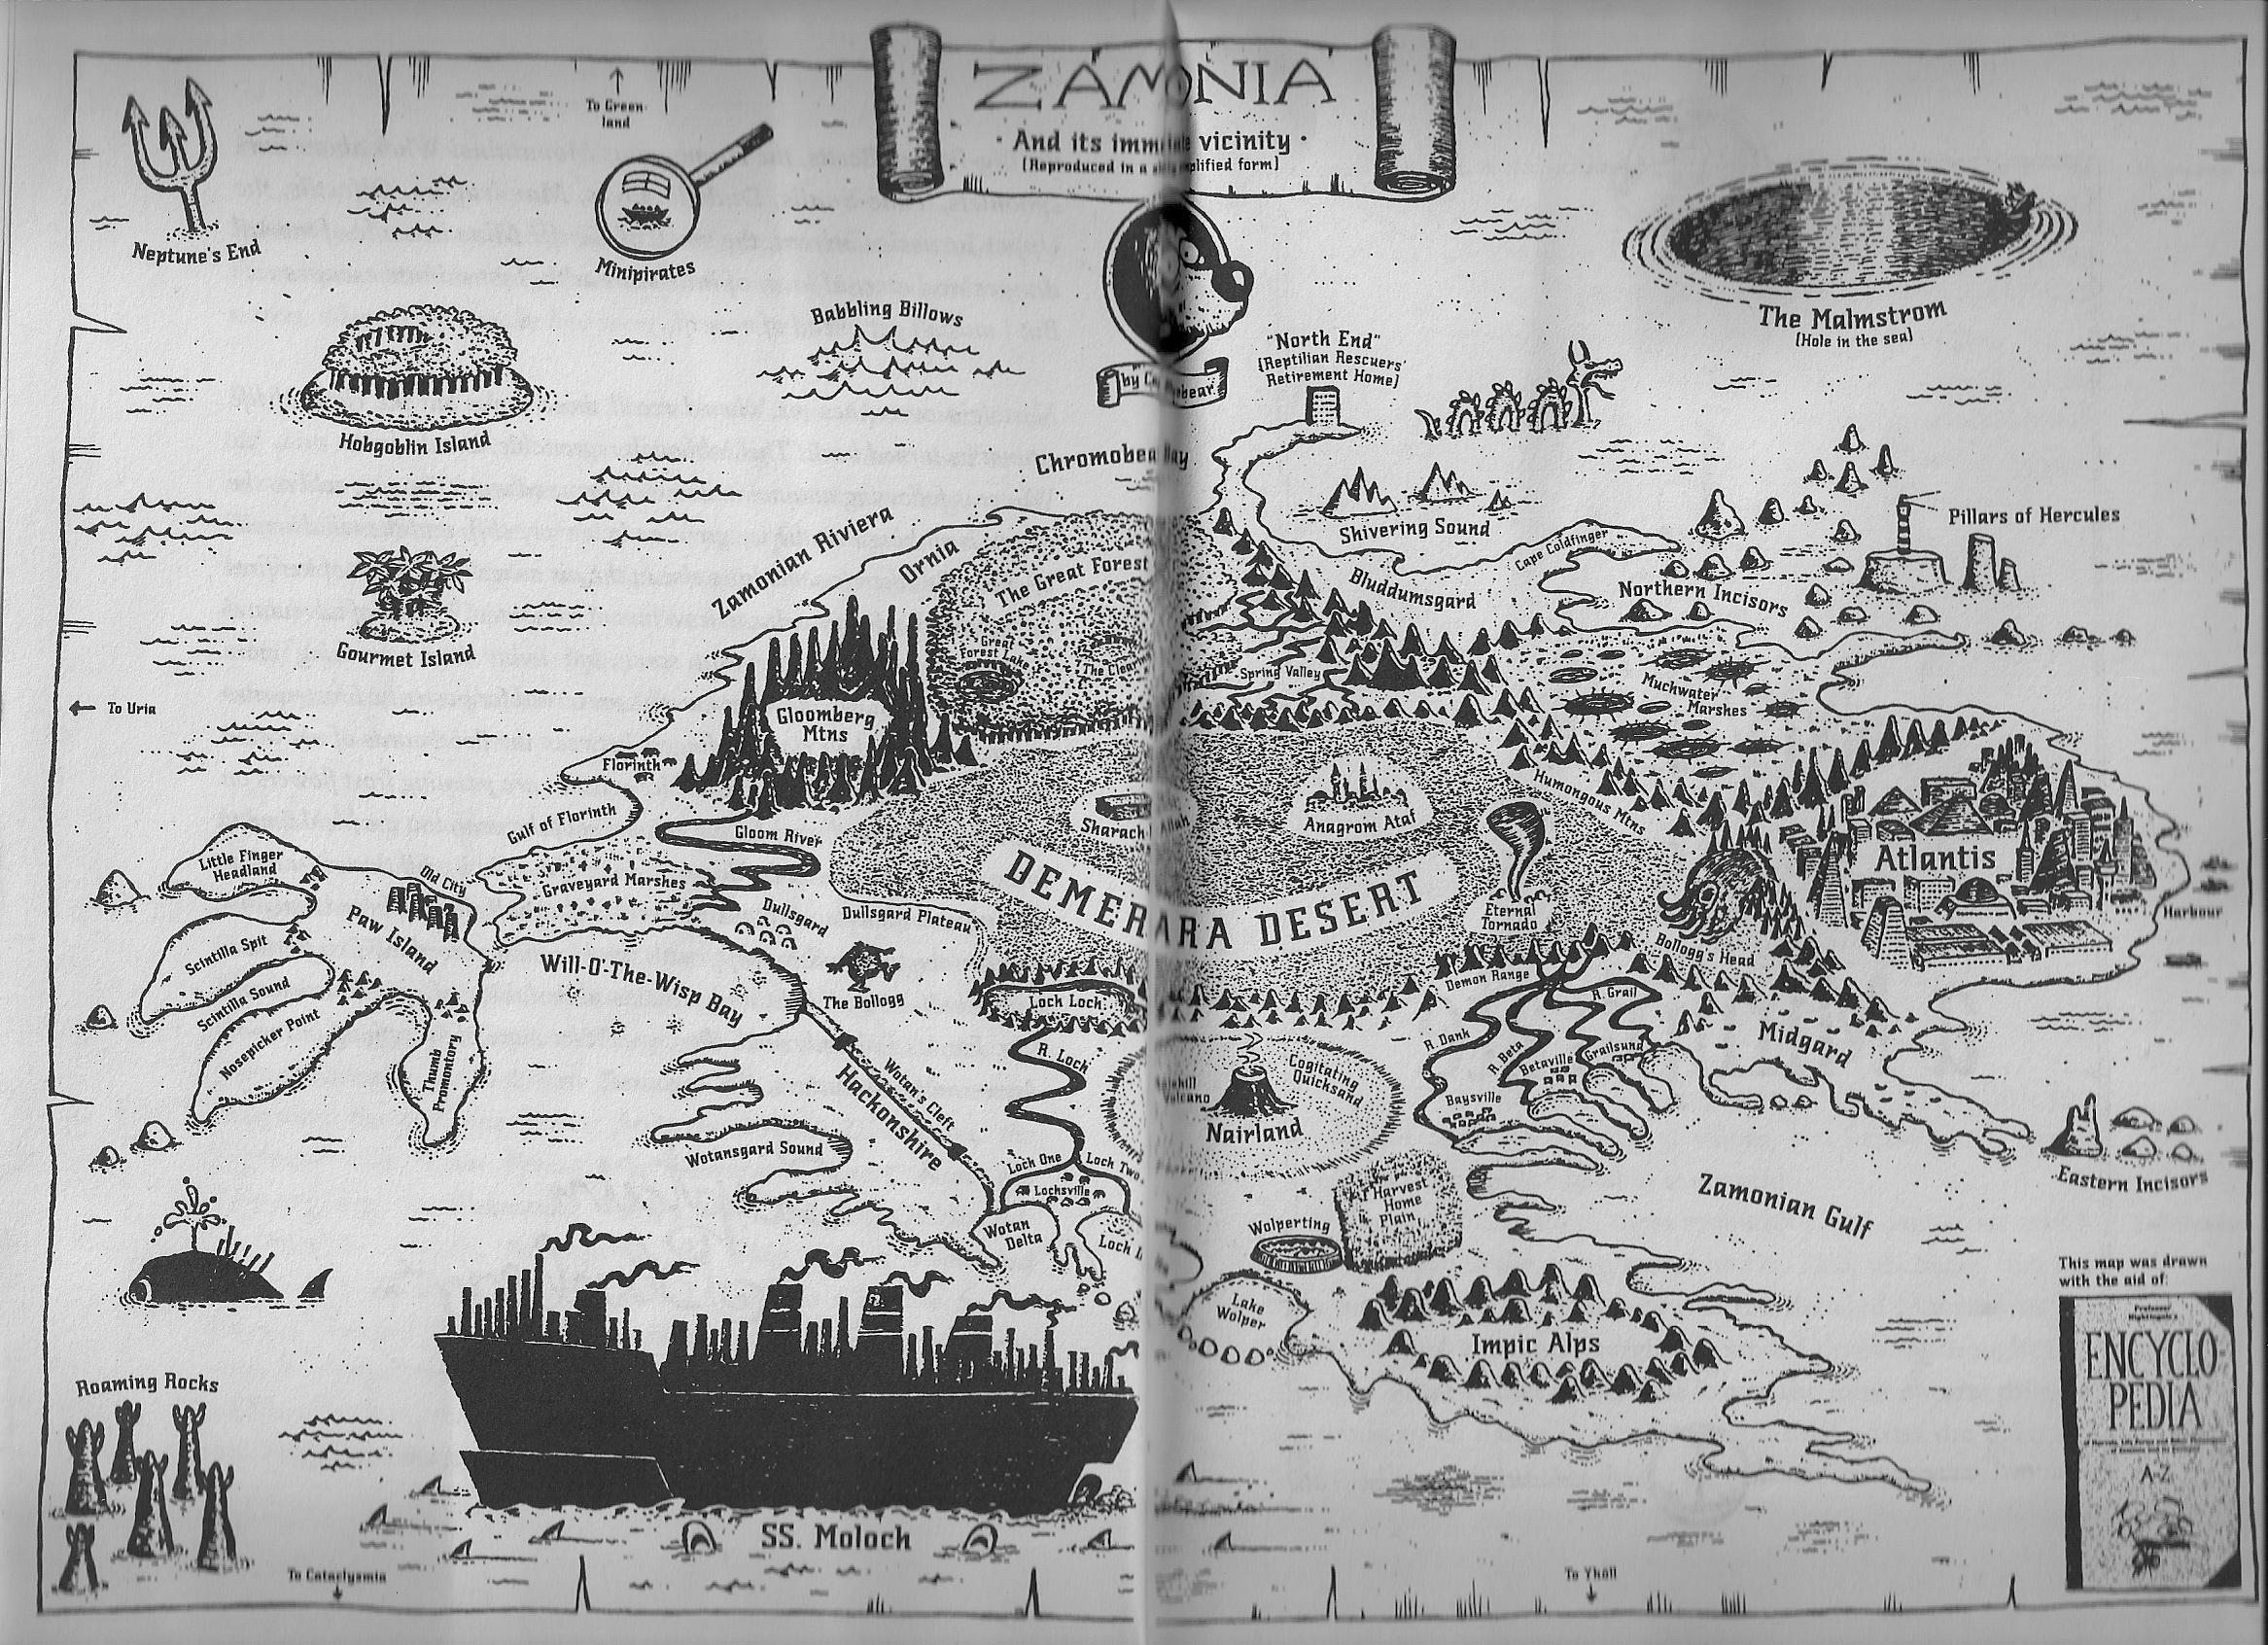 zamonien karte Map of Zamonien (Zamonias) from the wonderful book